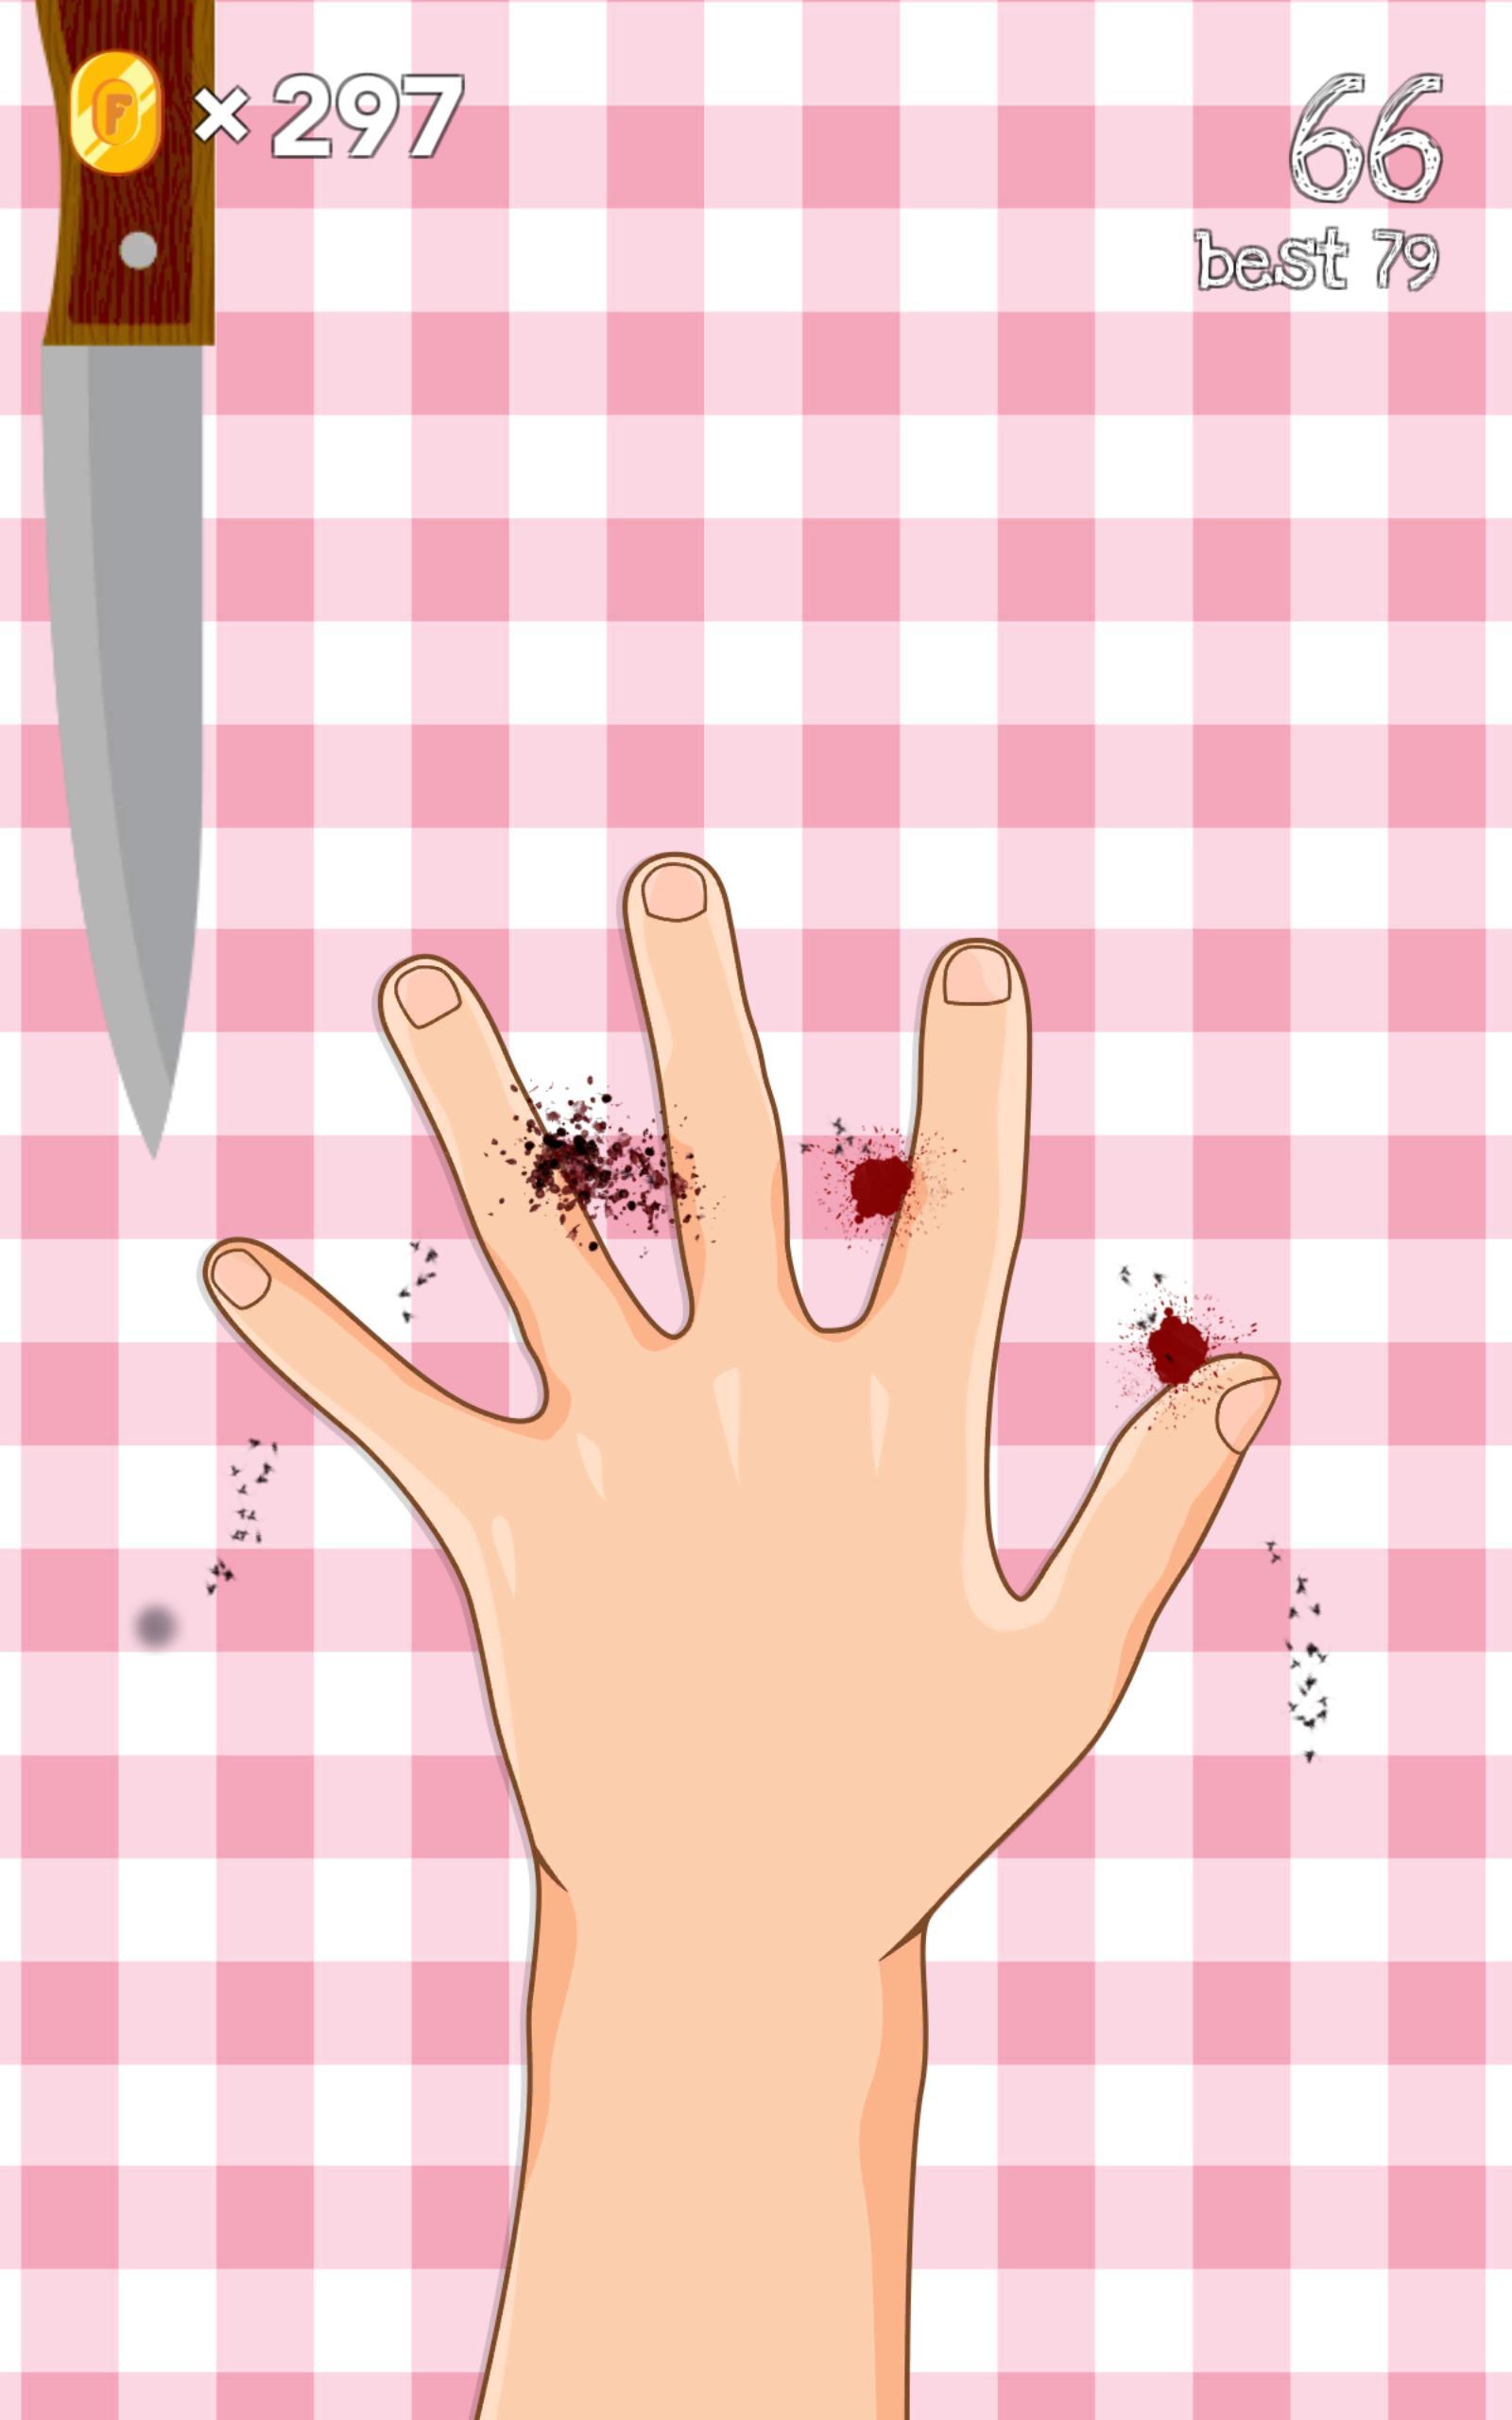 4 Fingers - free knife games 3.4 Screenshot 14